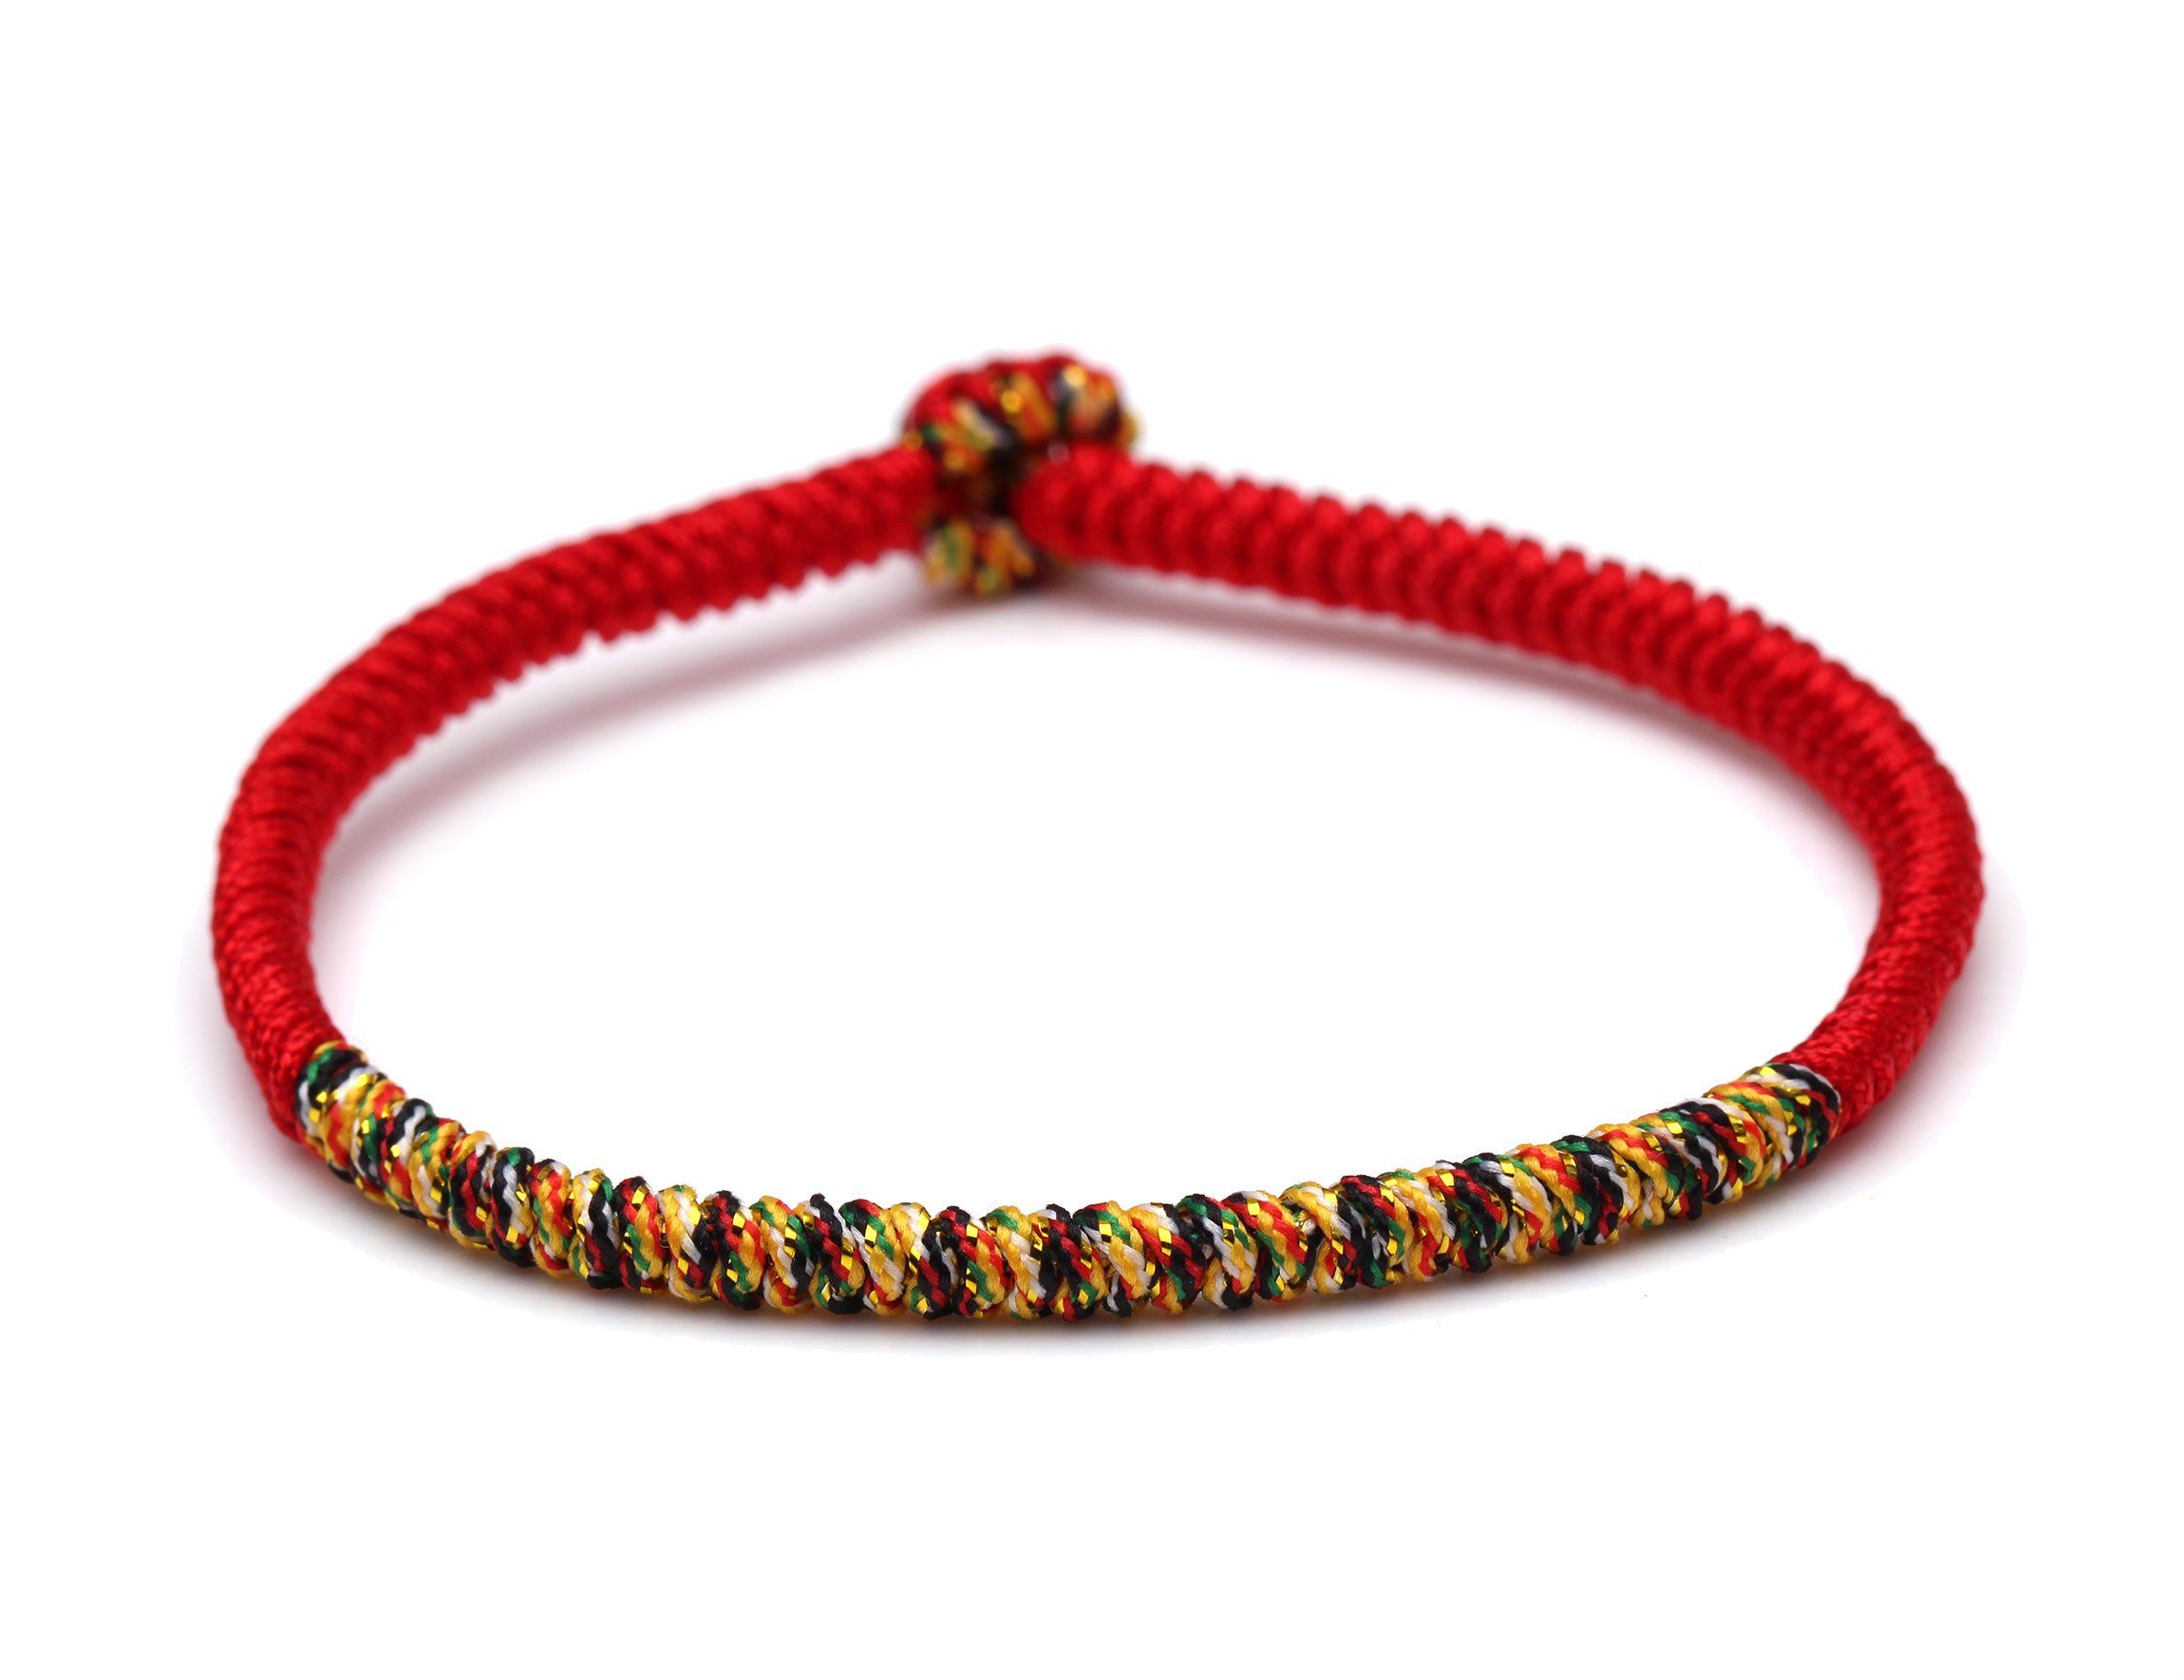 Tibetan Buddhist Lucky Knot Colorful Prayer Handmade Bracelet Women Men 2020 New Fashion String Braided Ethnic Jewelry Present